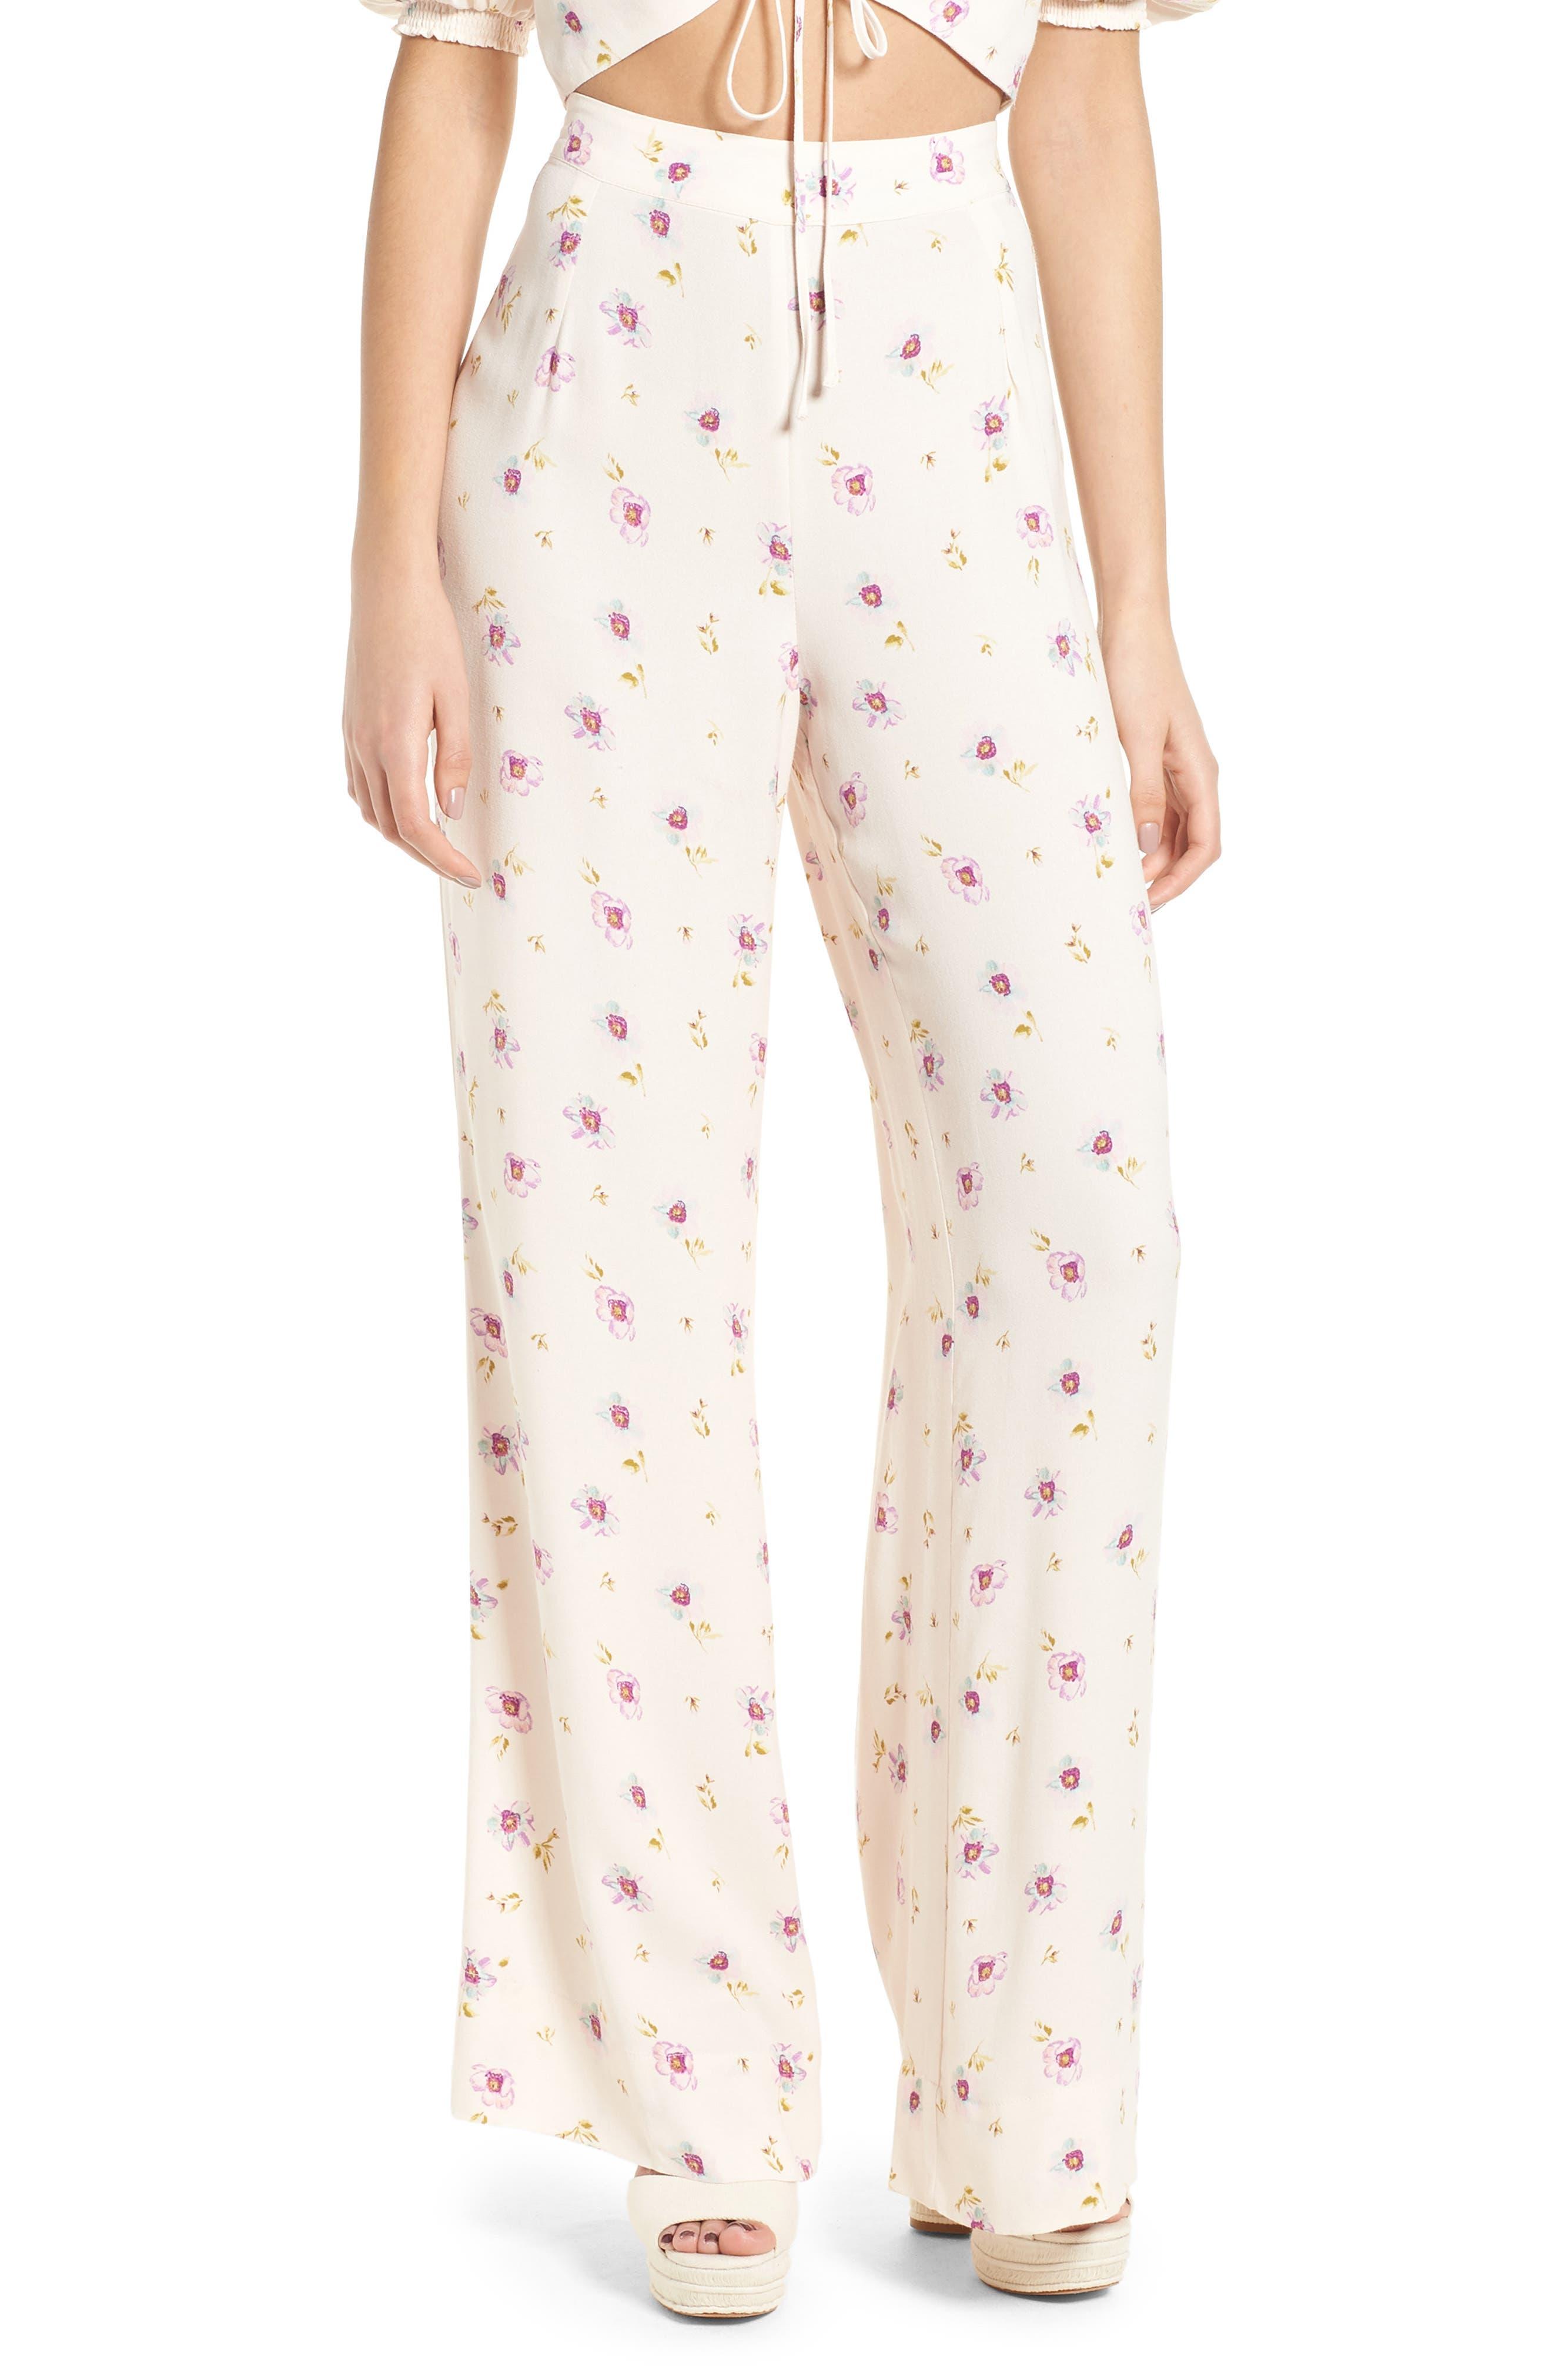 Carter High Waist Wide Leg Pants,                             Main thumbnail 1, color,                             Lilac Floral